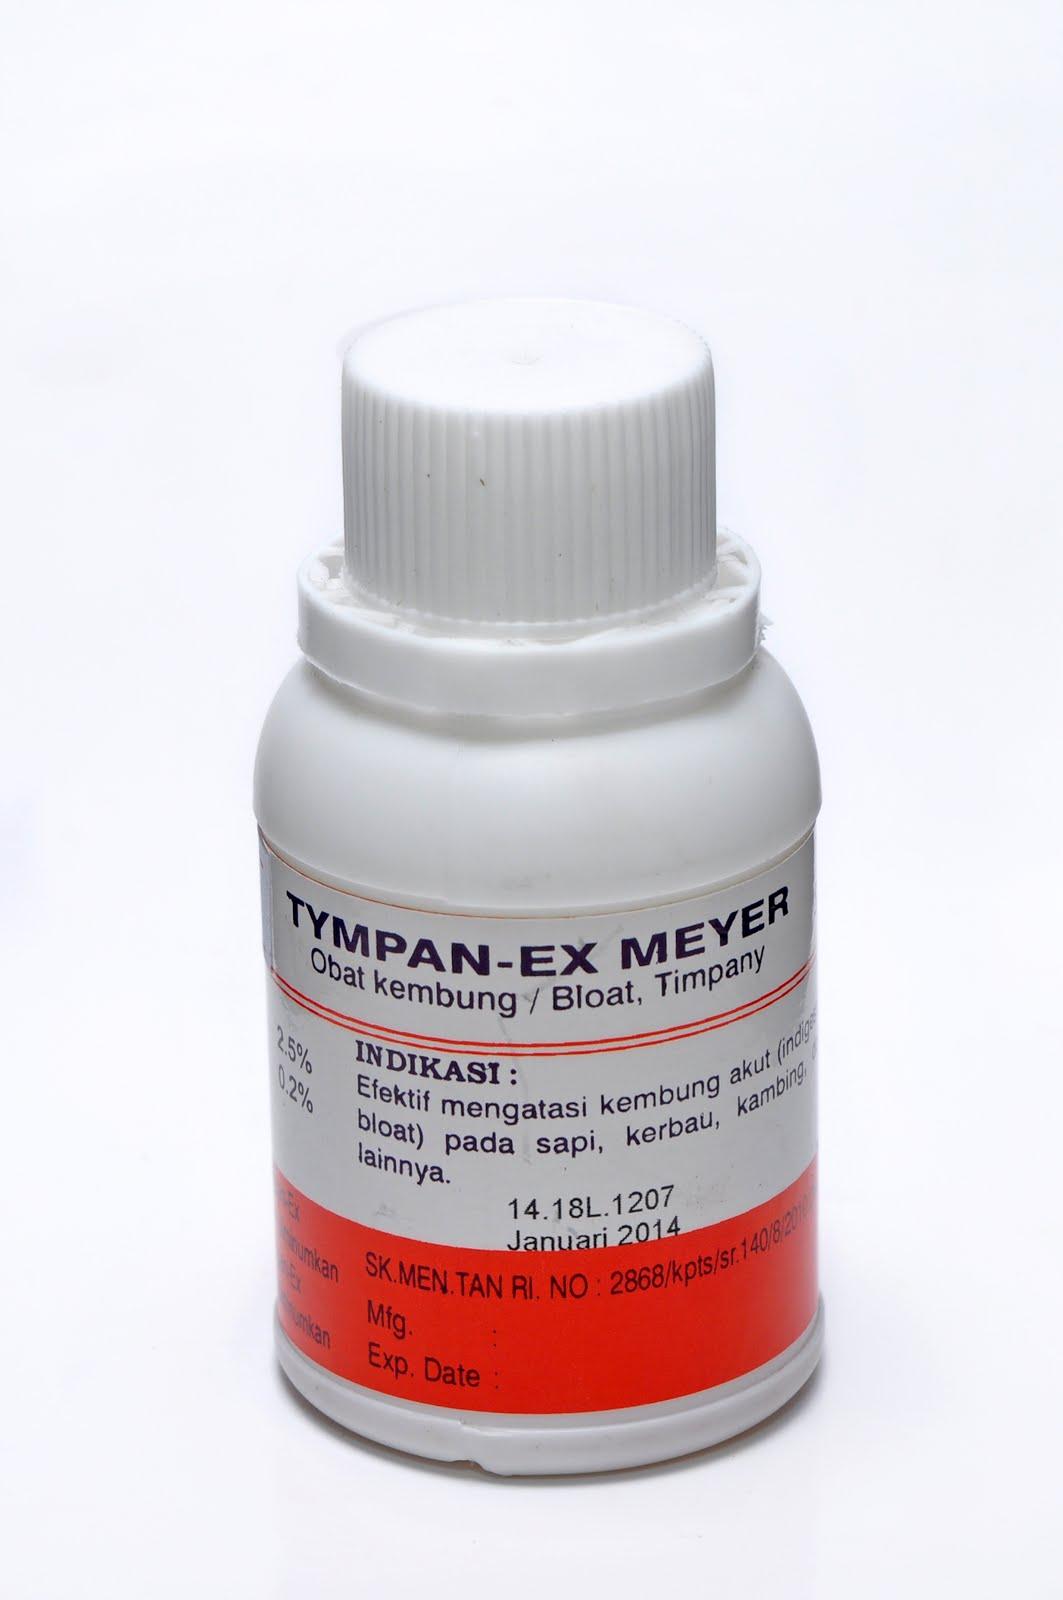 Tympan-Ex Meyer